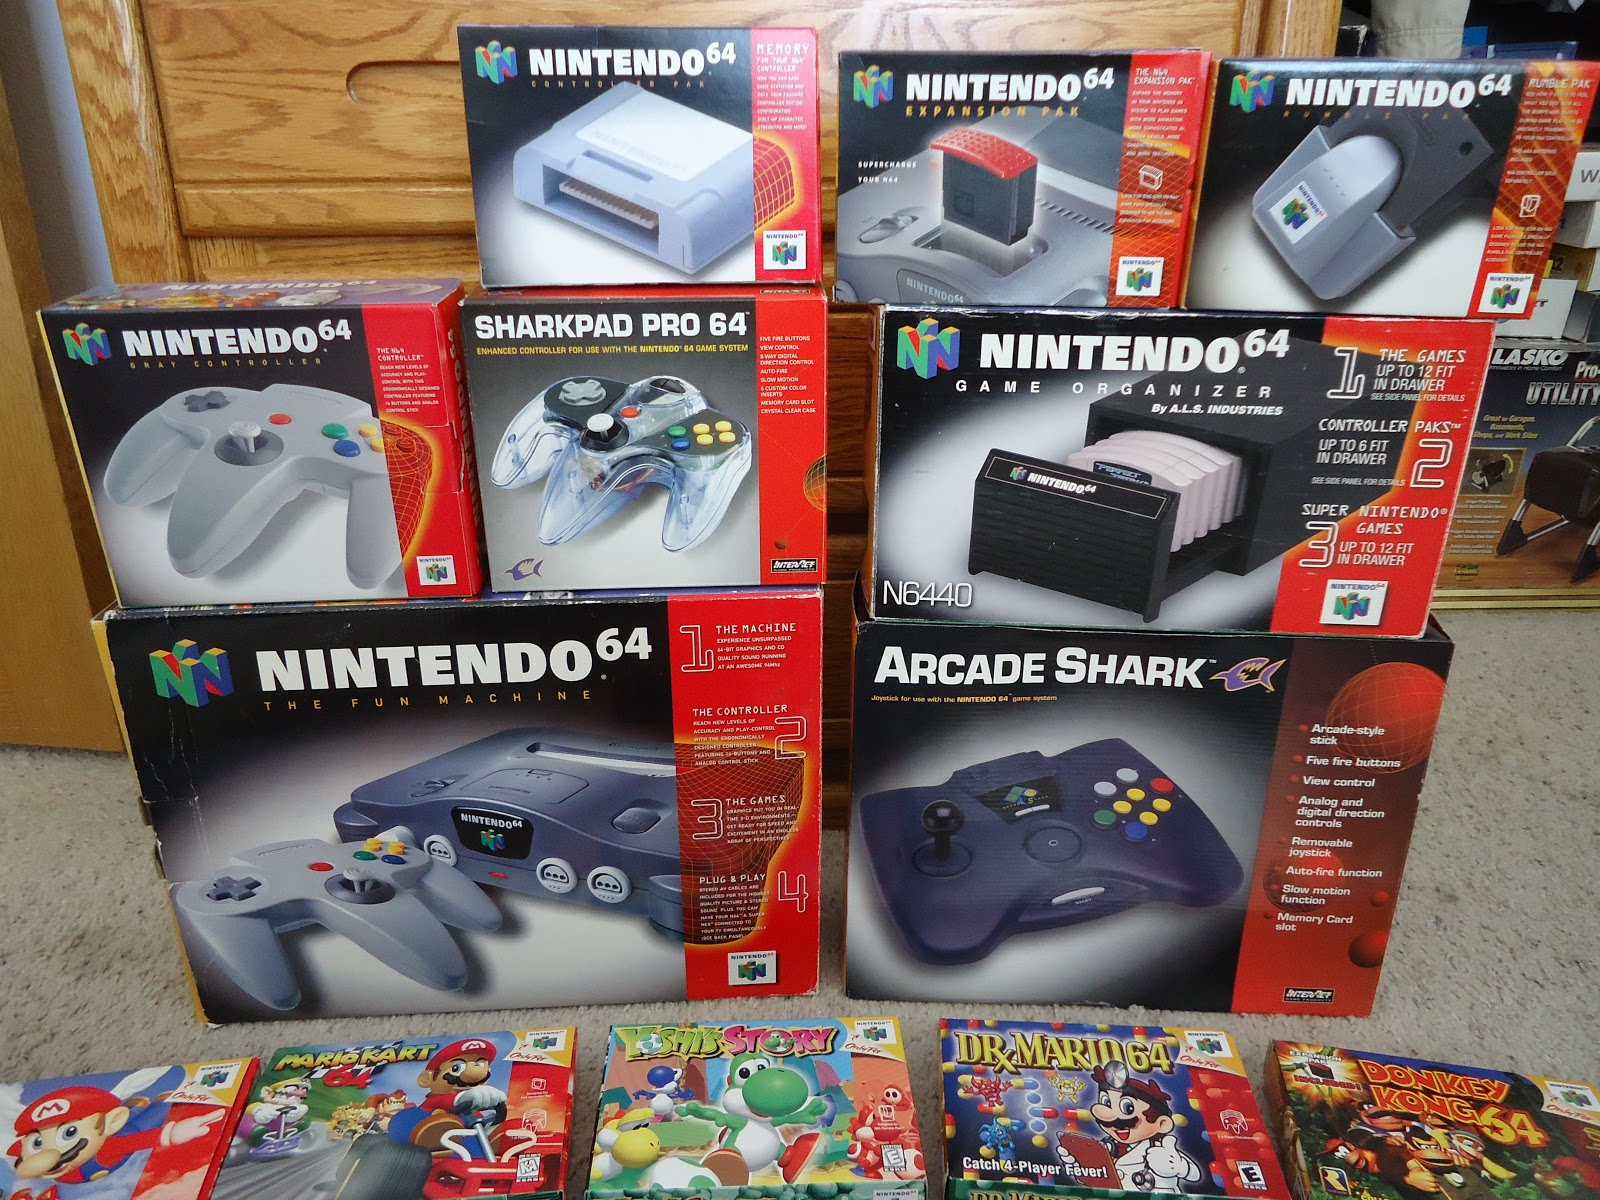 WatchmeplayNintendo: My Nintendo 64 Collection